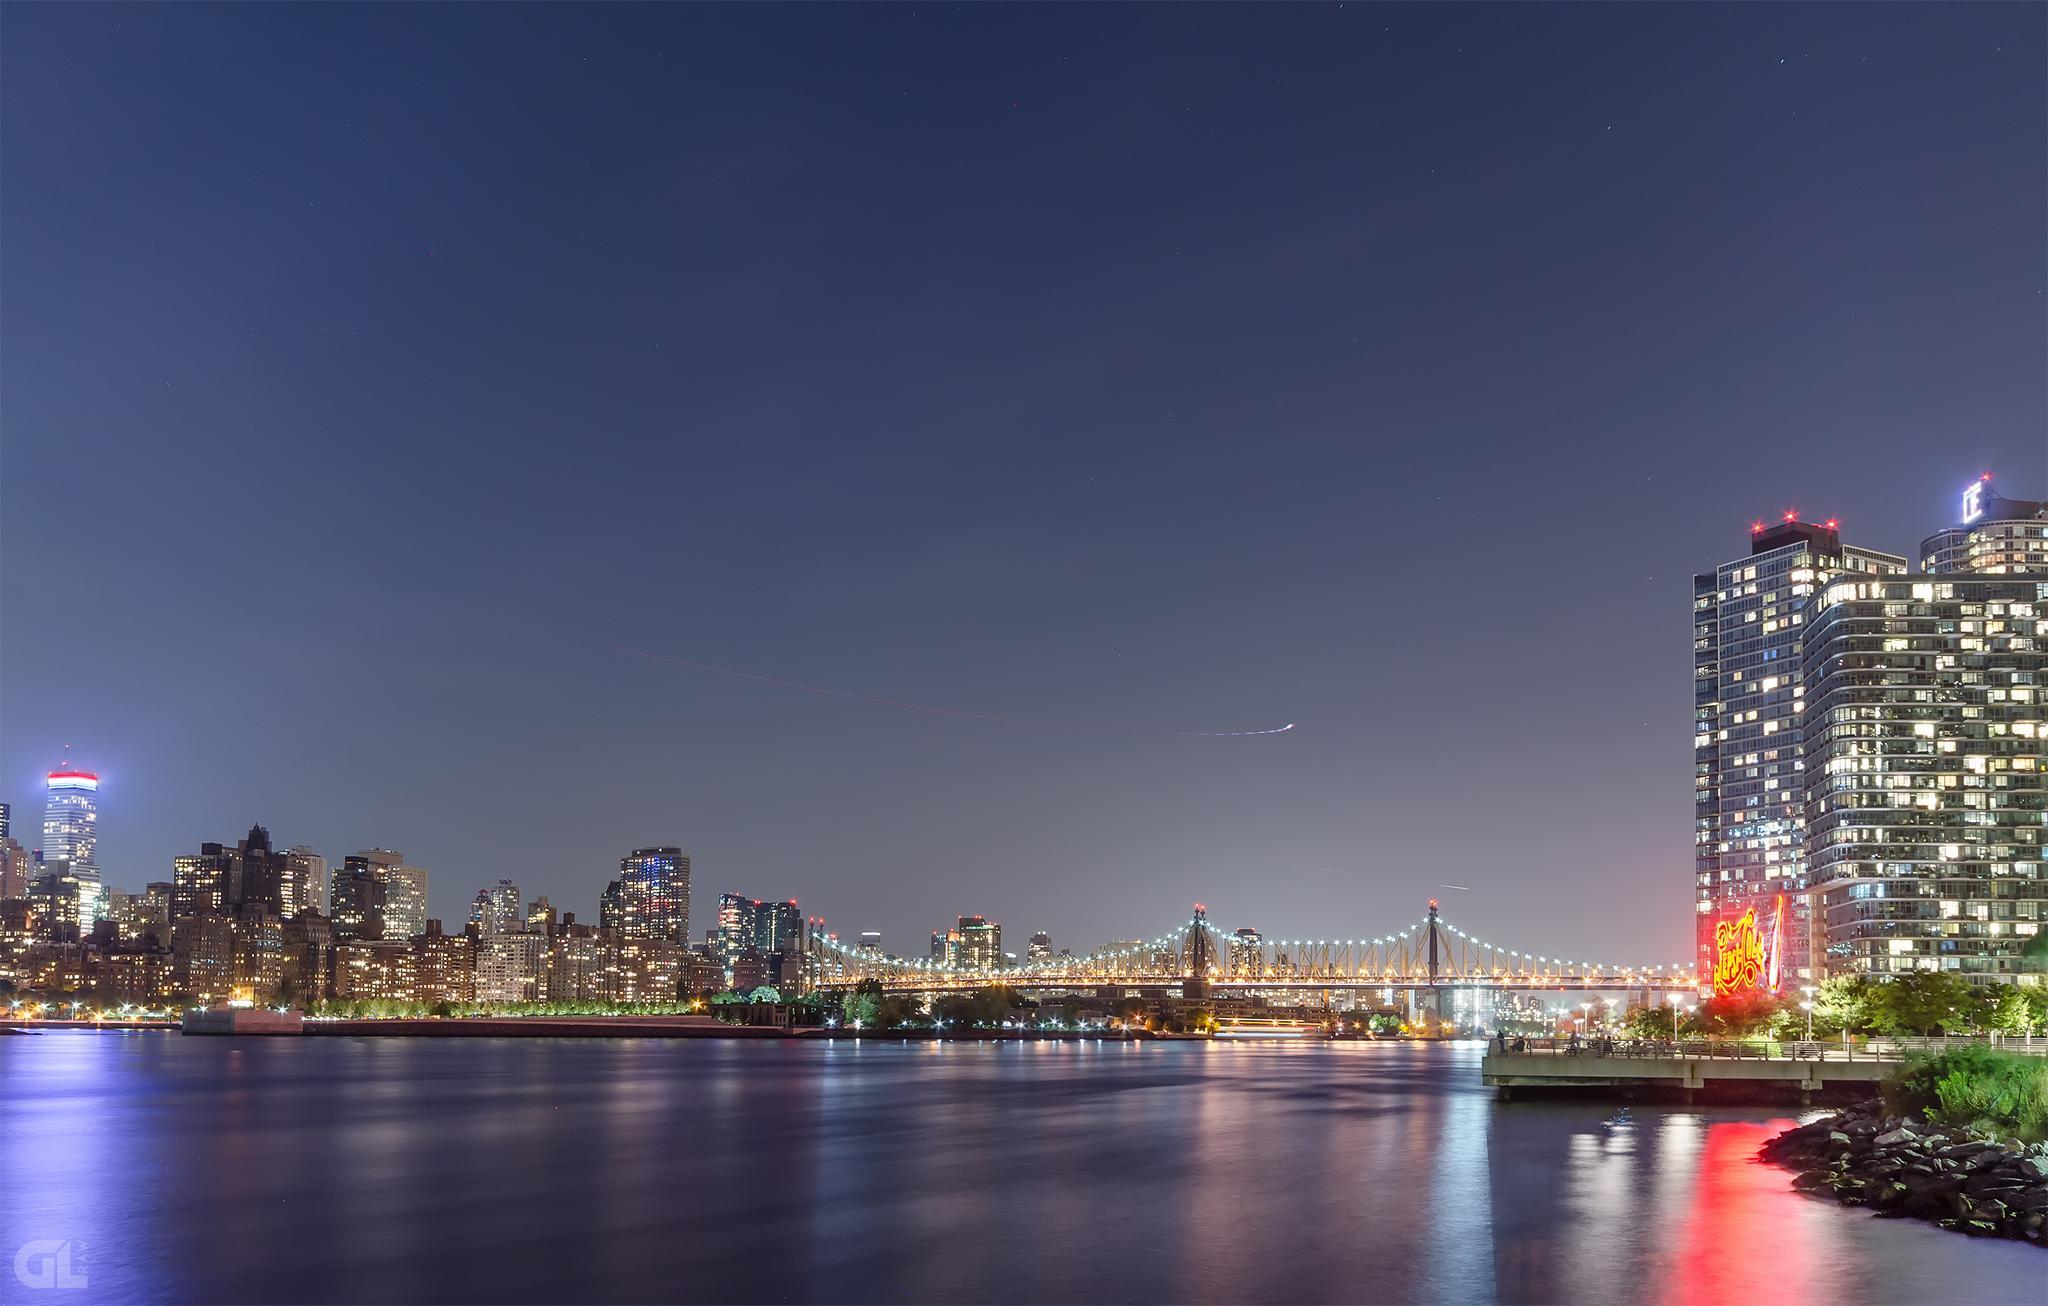 Ed Koch Queensboro Bridge by GL Photography